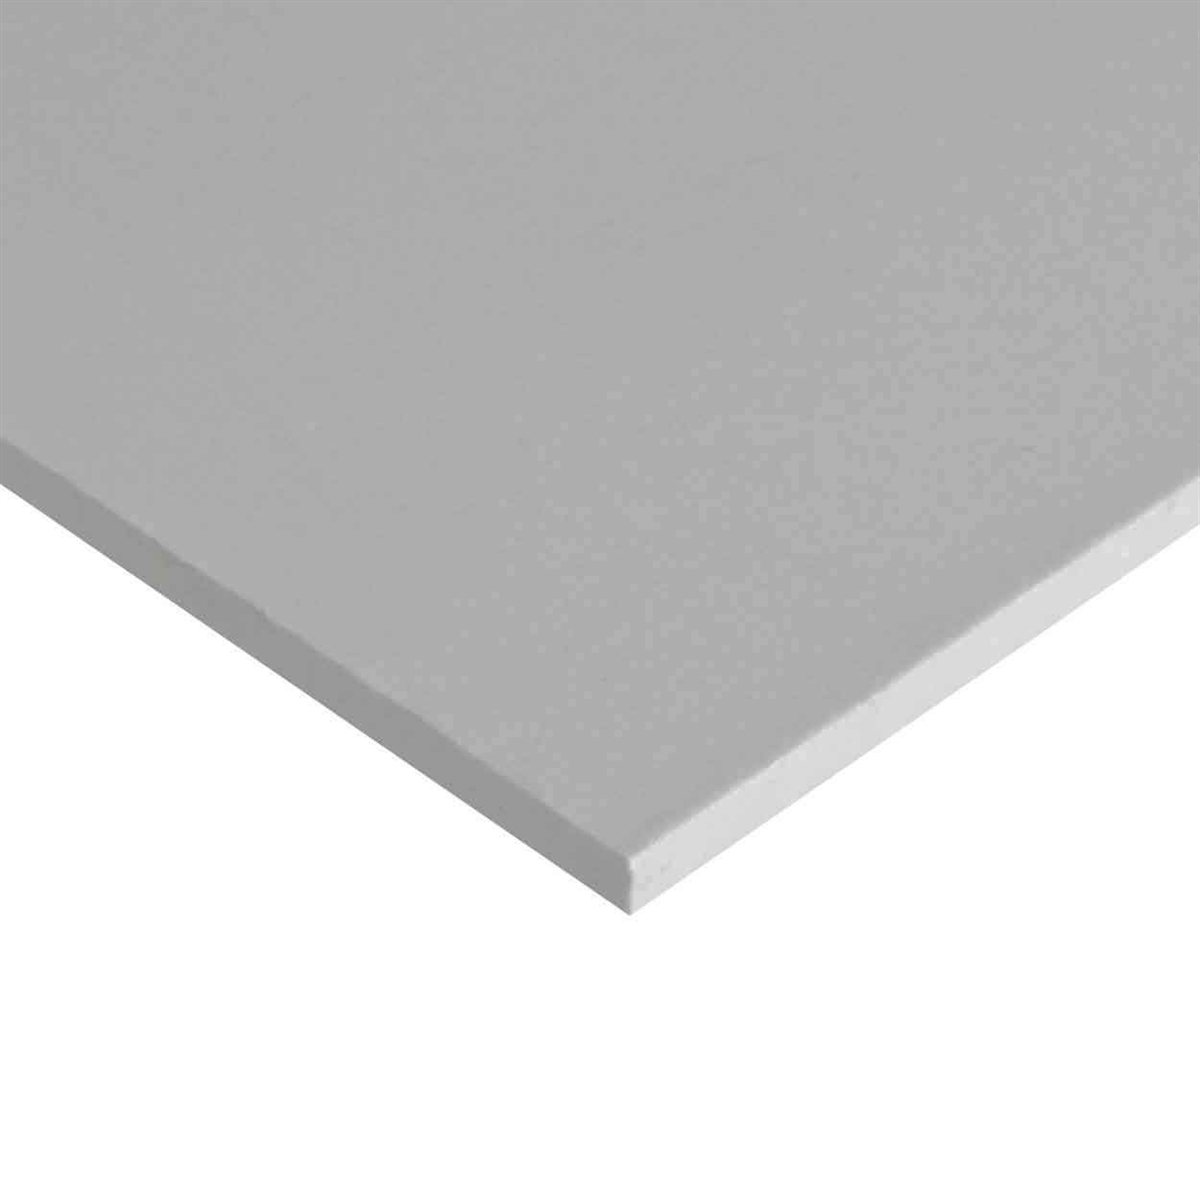 3//8 X 27 X 48 Dolphin grey  King Starboard Polymer Marine Board 24 12 54